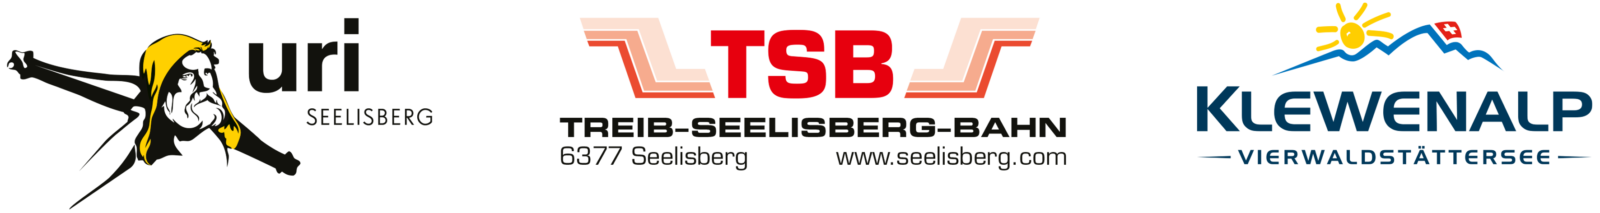 Seelisberg Tourismus